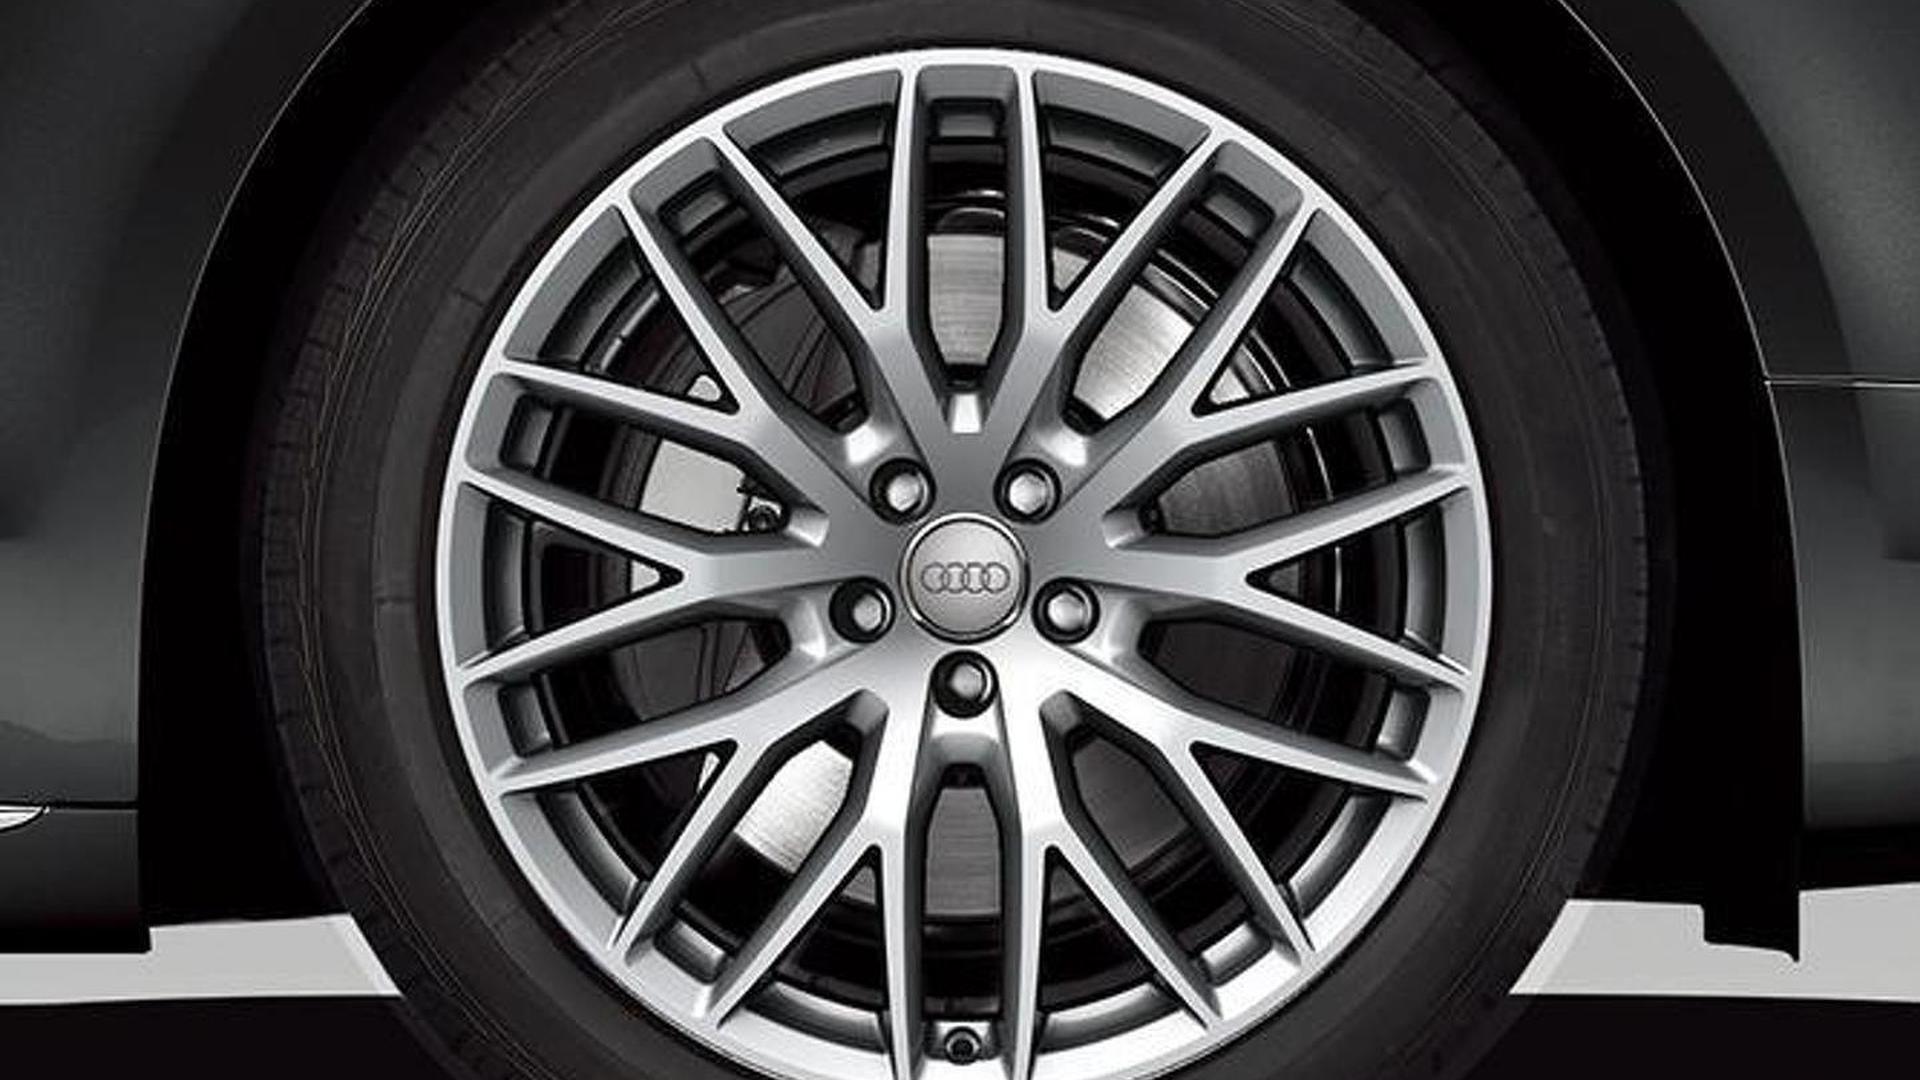 Audi A8 L Chauffeur special edition announced  Motor1com Photos